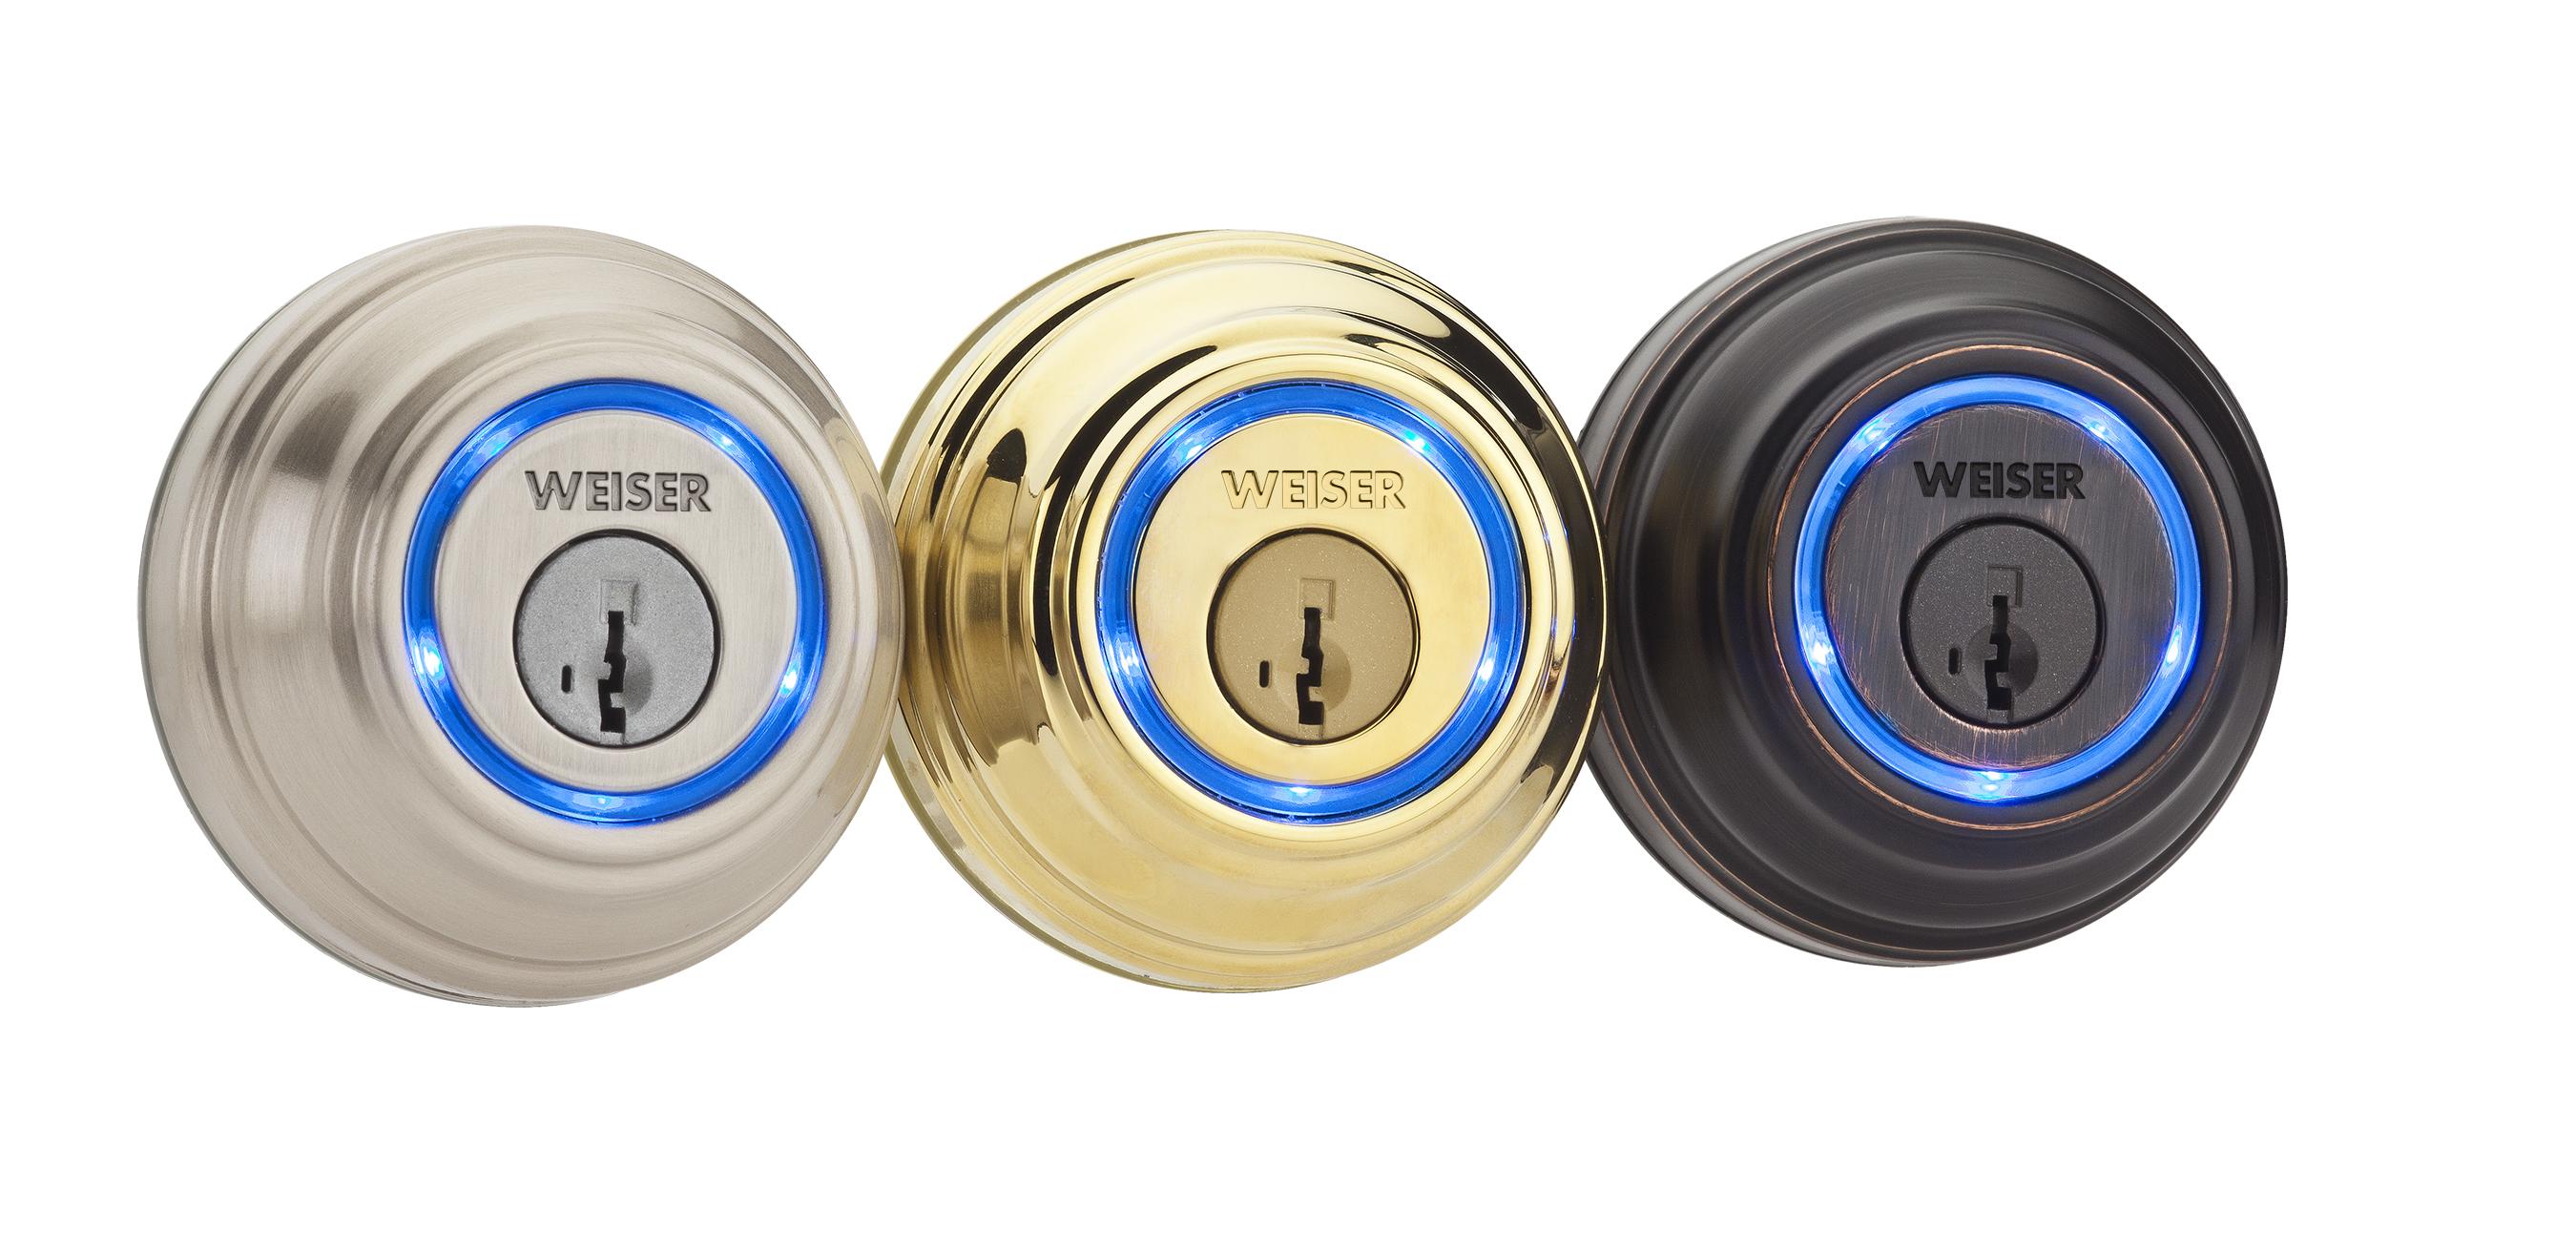 Weiser S Unikey Powered Kevo Smart Door Lock Comes To